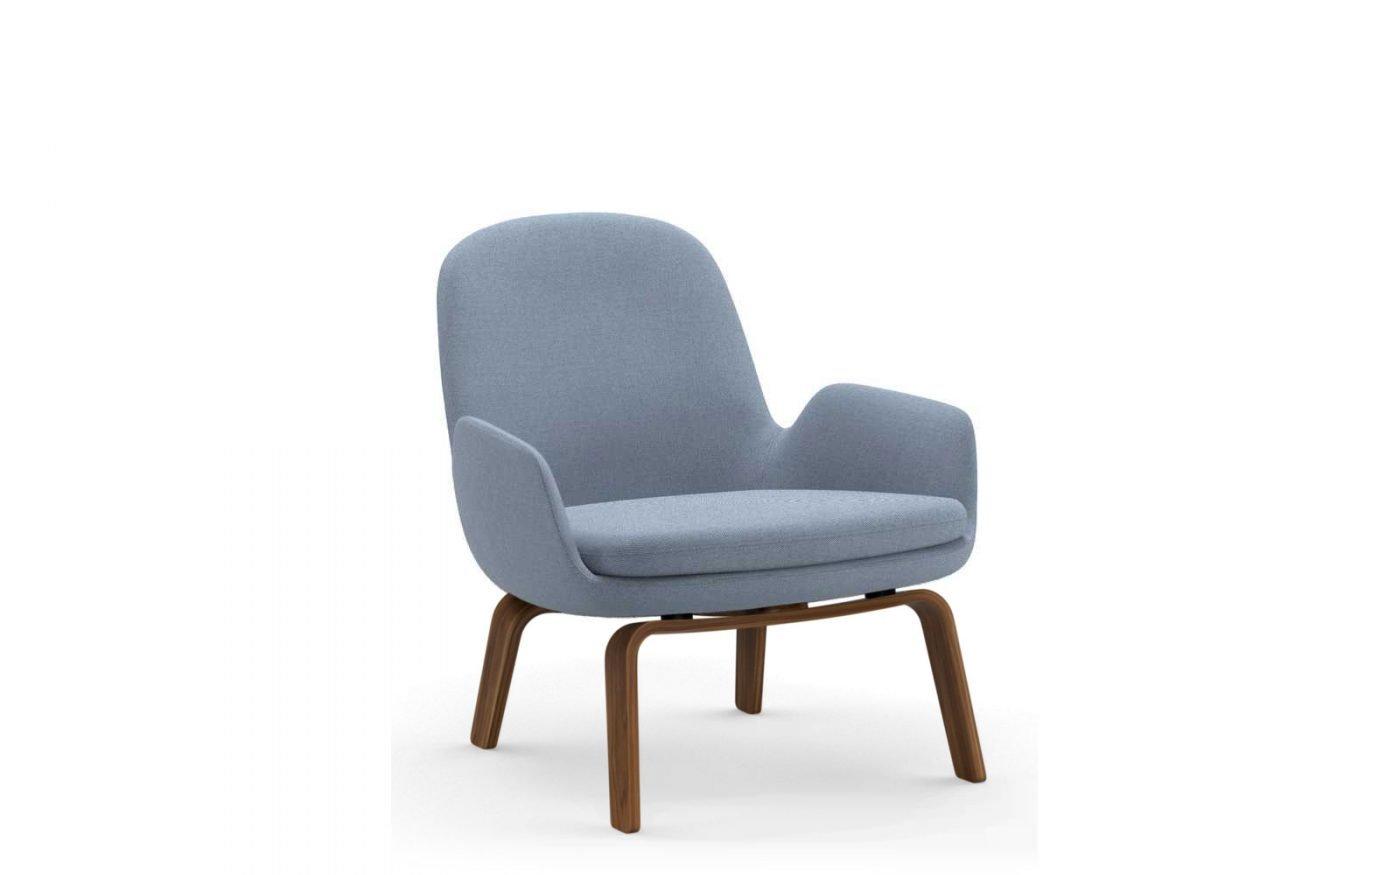 Era-Lounge-Chair-Low-wooden-normann-copenhagen-Era-Lounge-Chair-Low-wooden-normann-copenhagen-Breeze-Fusion-4601-walnut-4